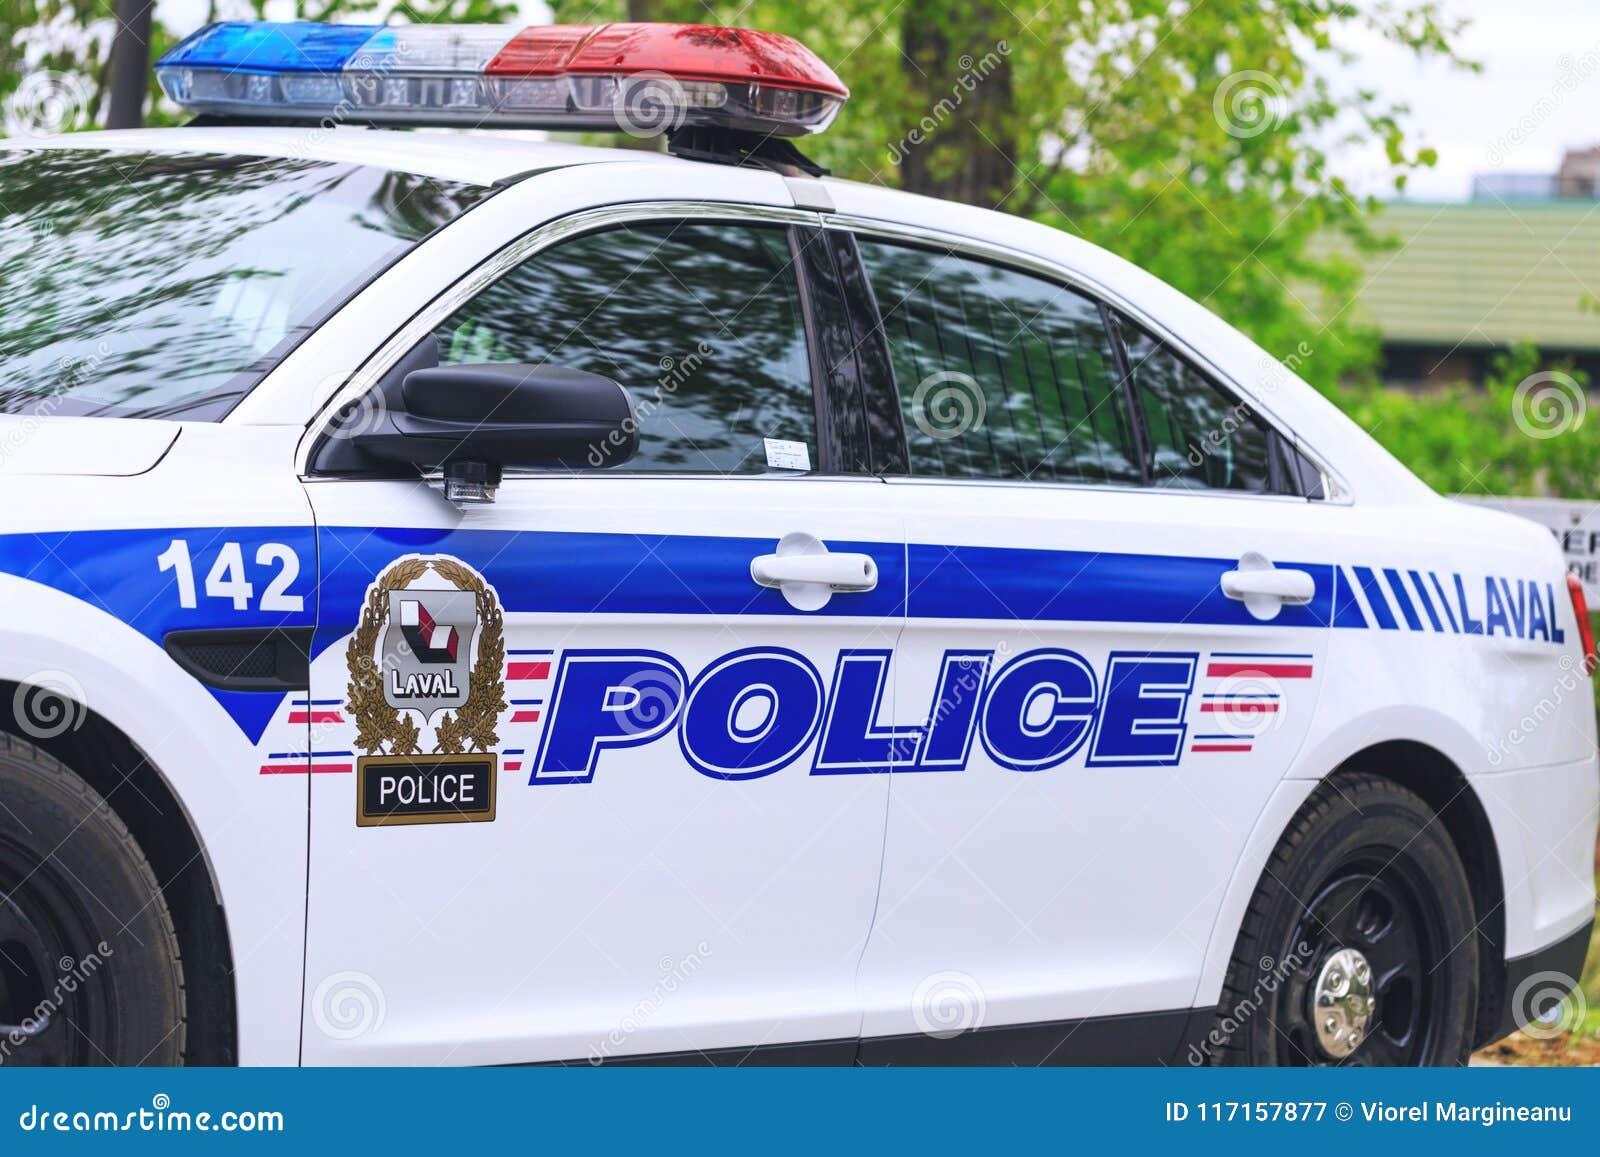 Laval, Καναδάς: Στις 19 Μαΐου 2018 Το όμορφο αυτοκίνητο της καναδικής αστυνομίας είναι